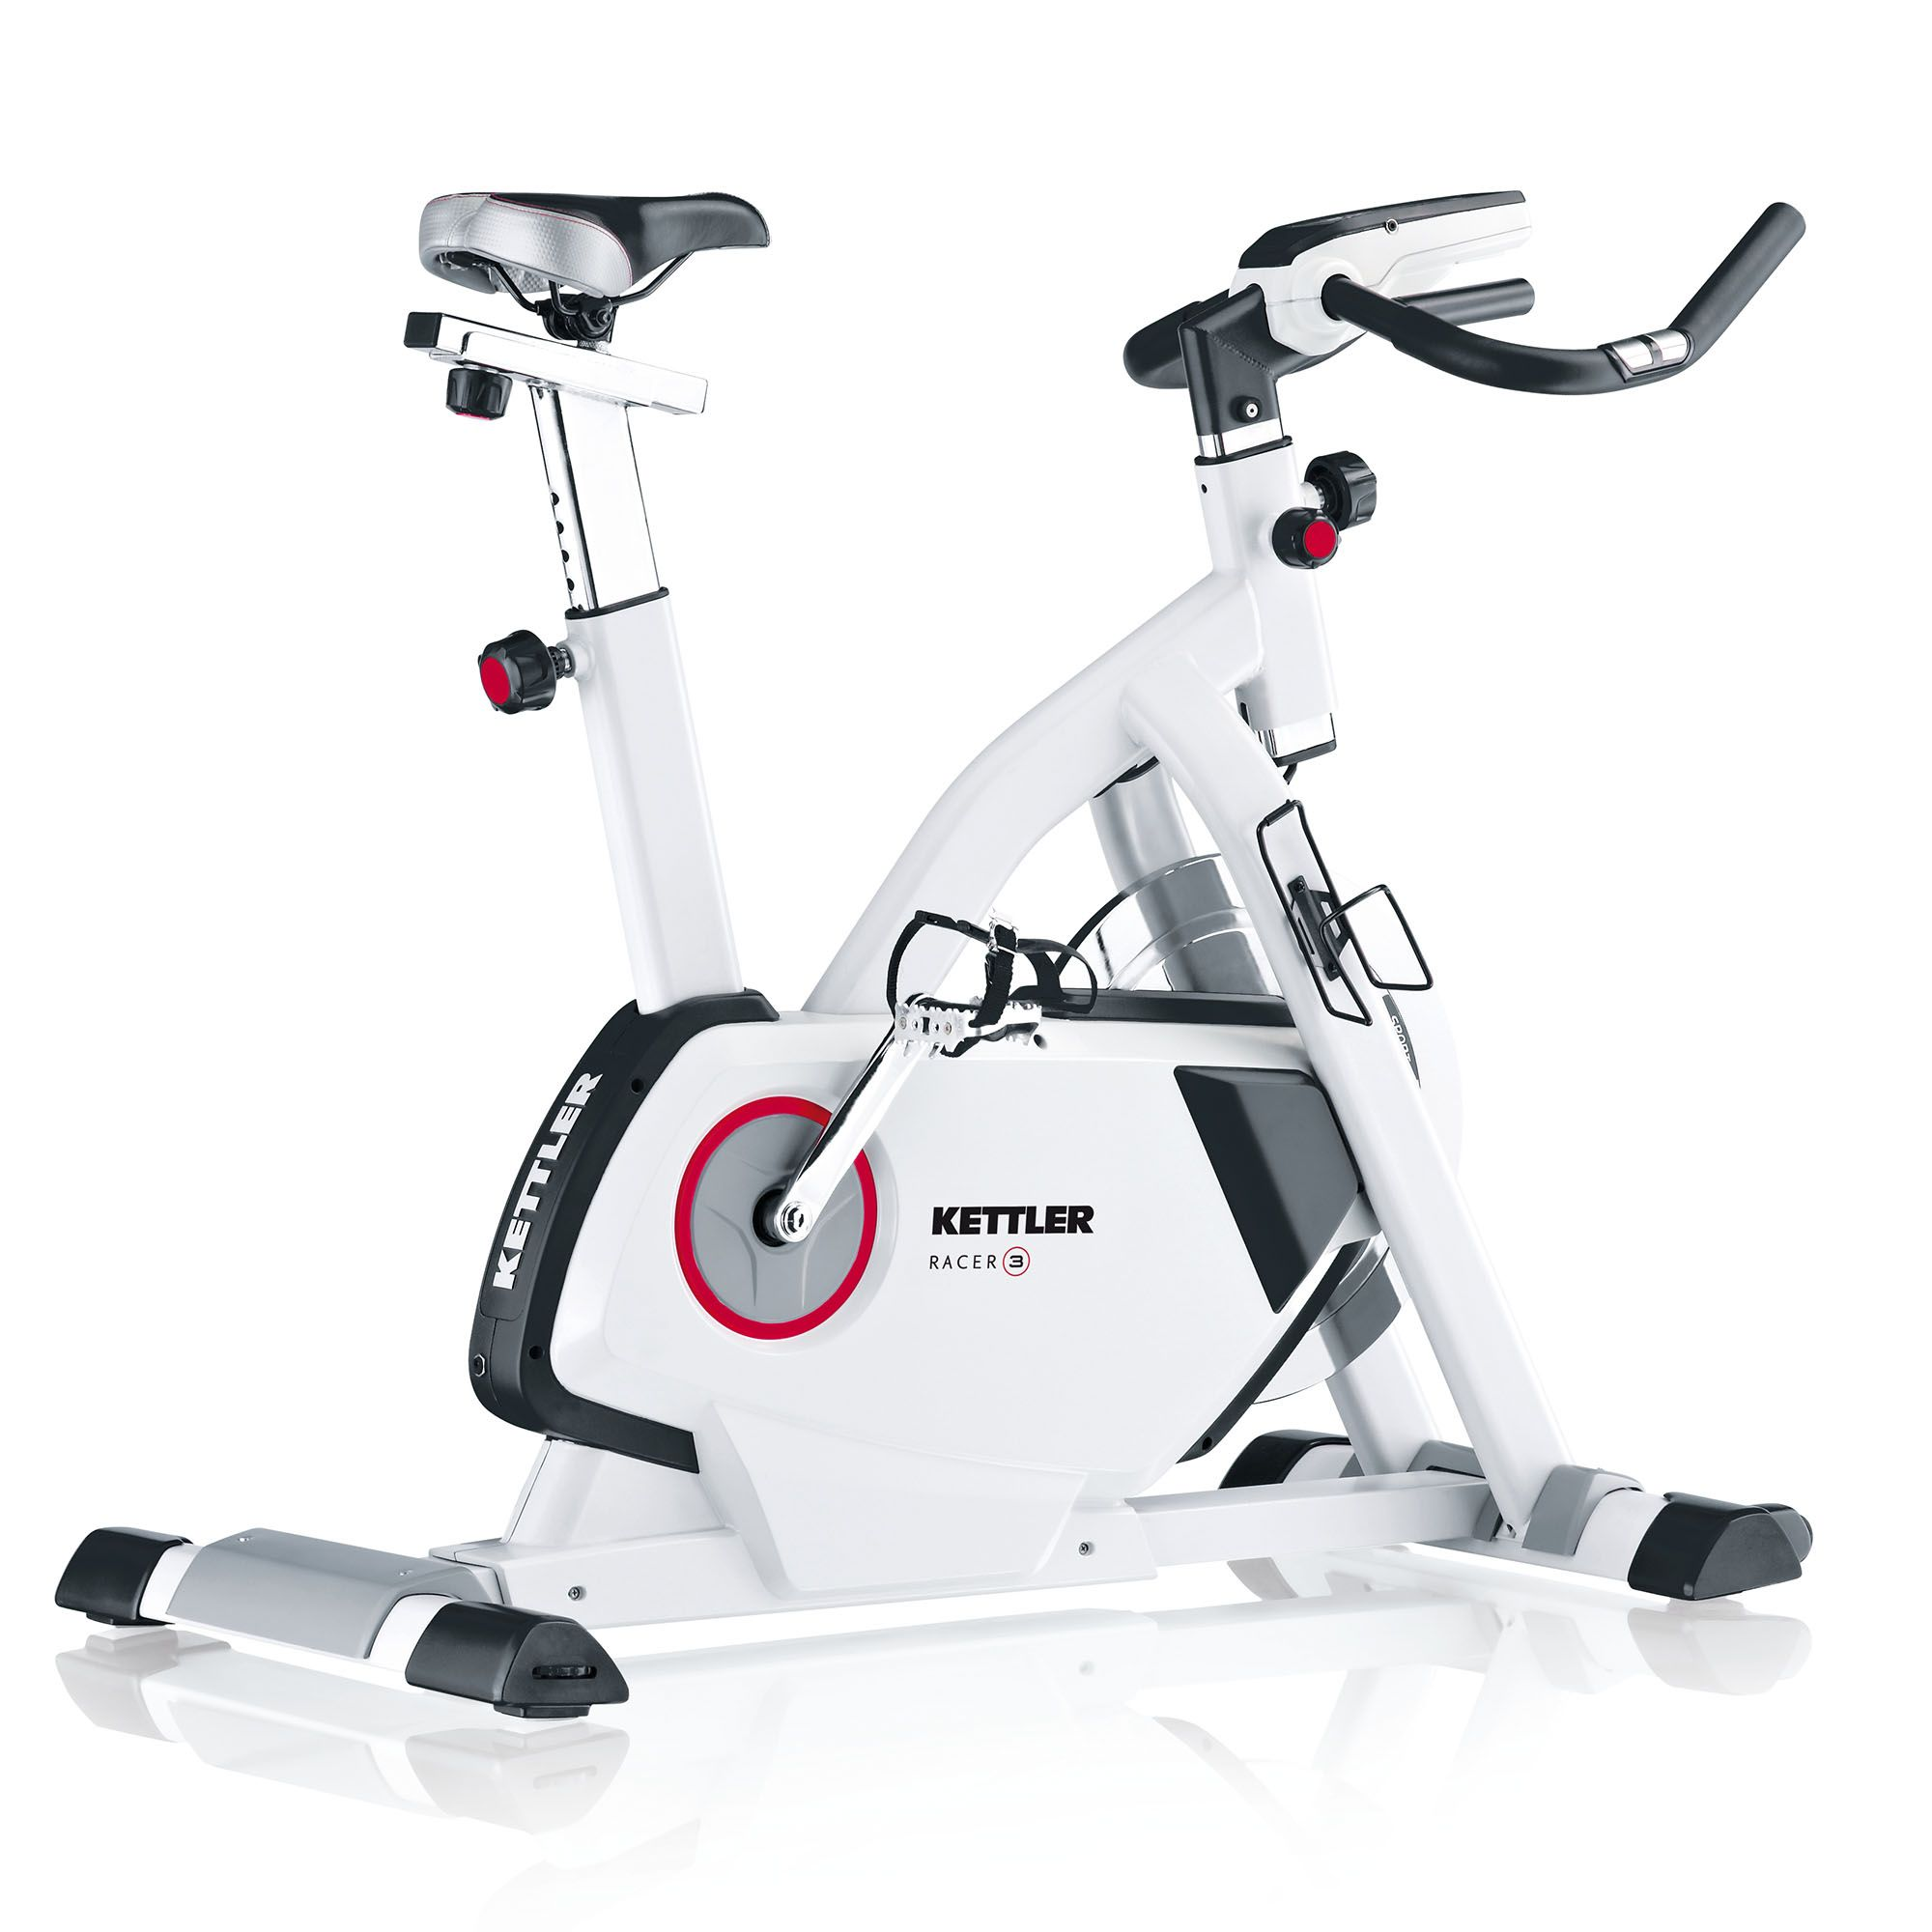 Kettler Racer 3 Indoor Cycle Sweatband Com